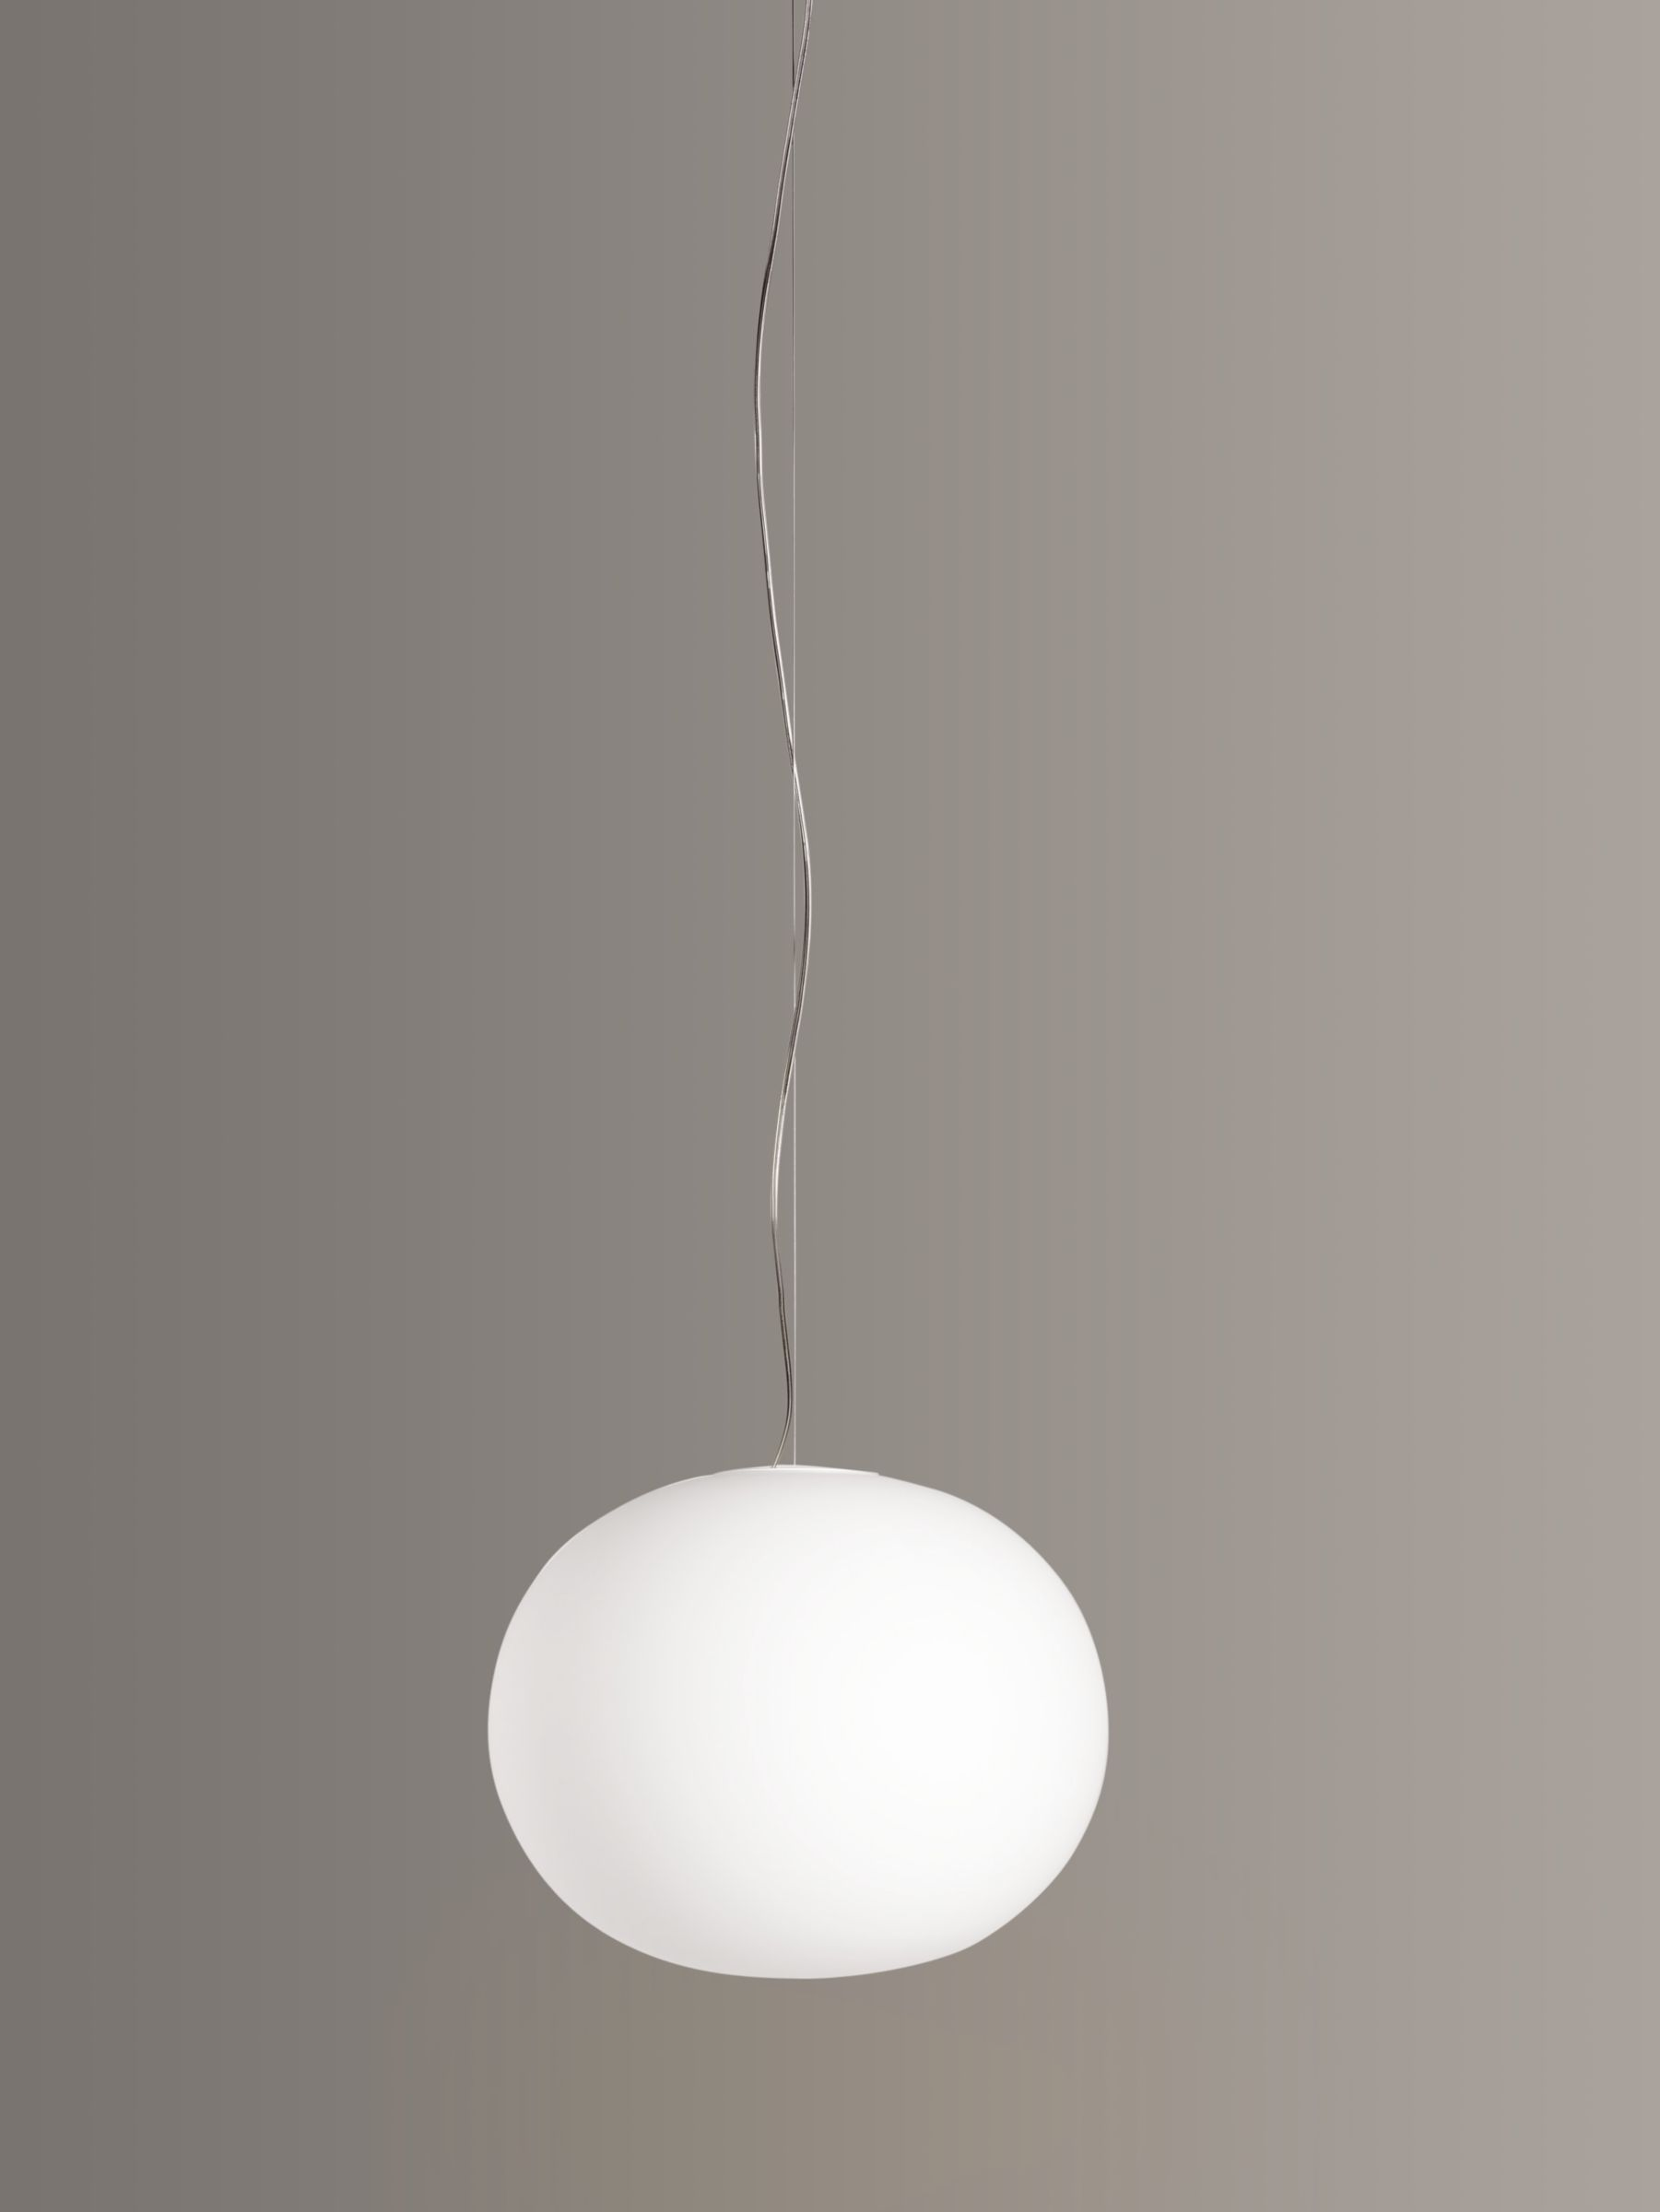 Flos Flos Glo-Ball S1 Ceiling Light